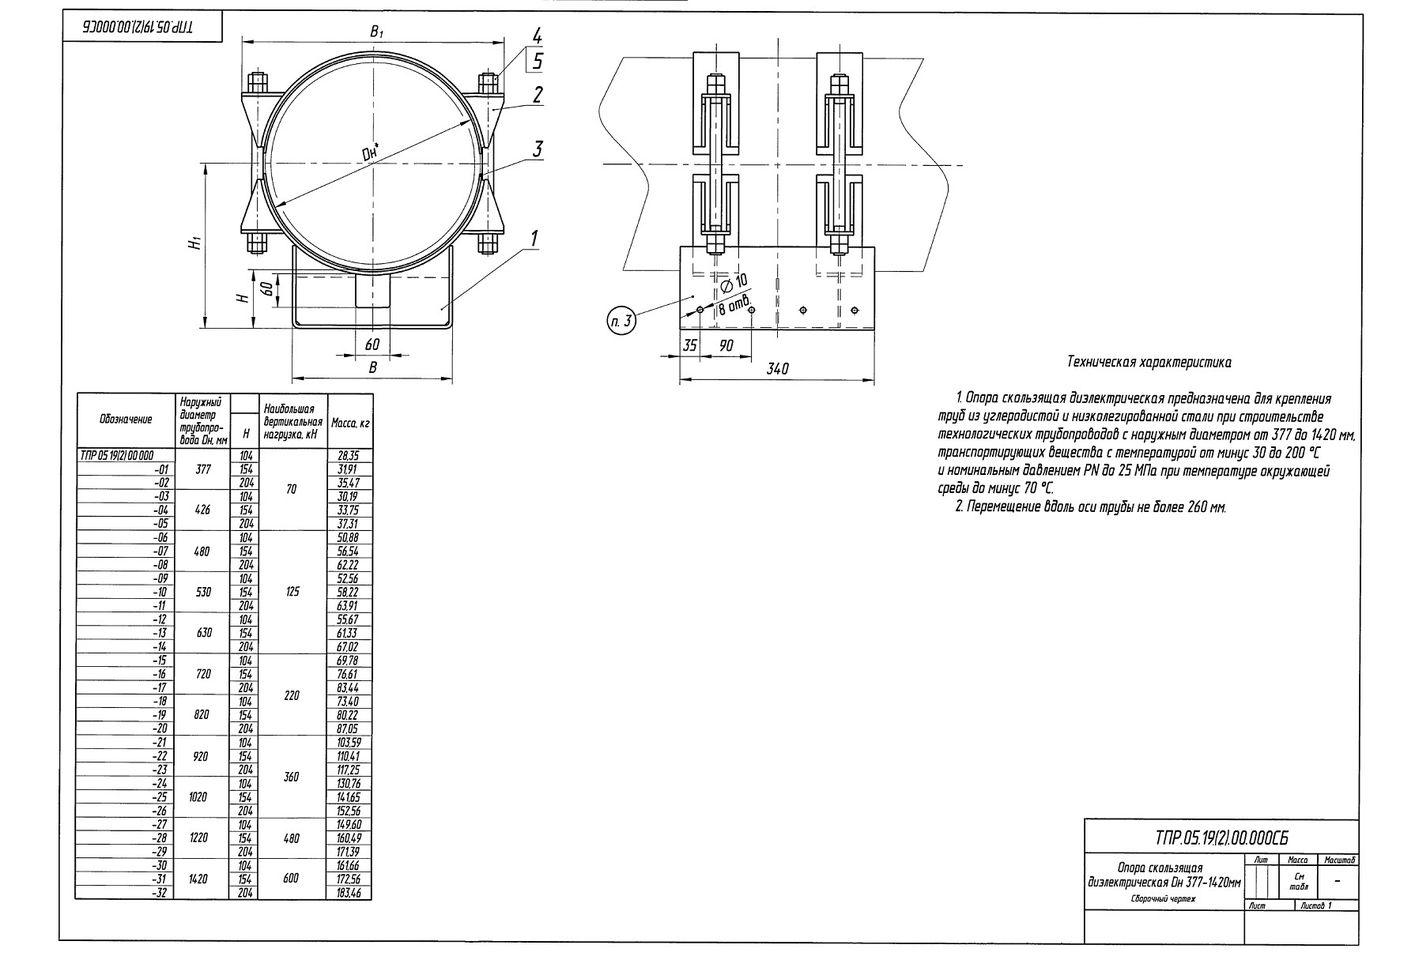 ТПР.05.19(2).00.000 Опоры скользящие диэлектрические Дн377-1420 мм